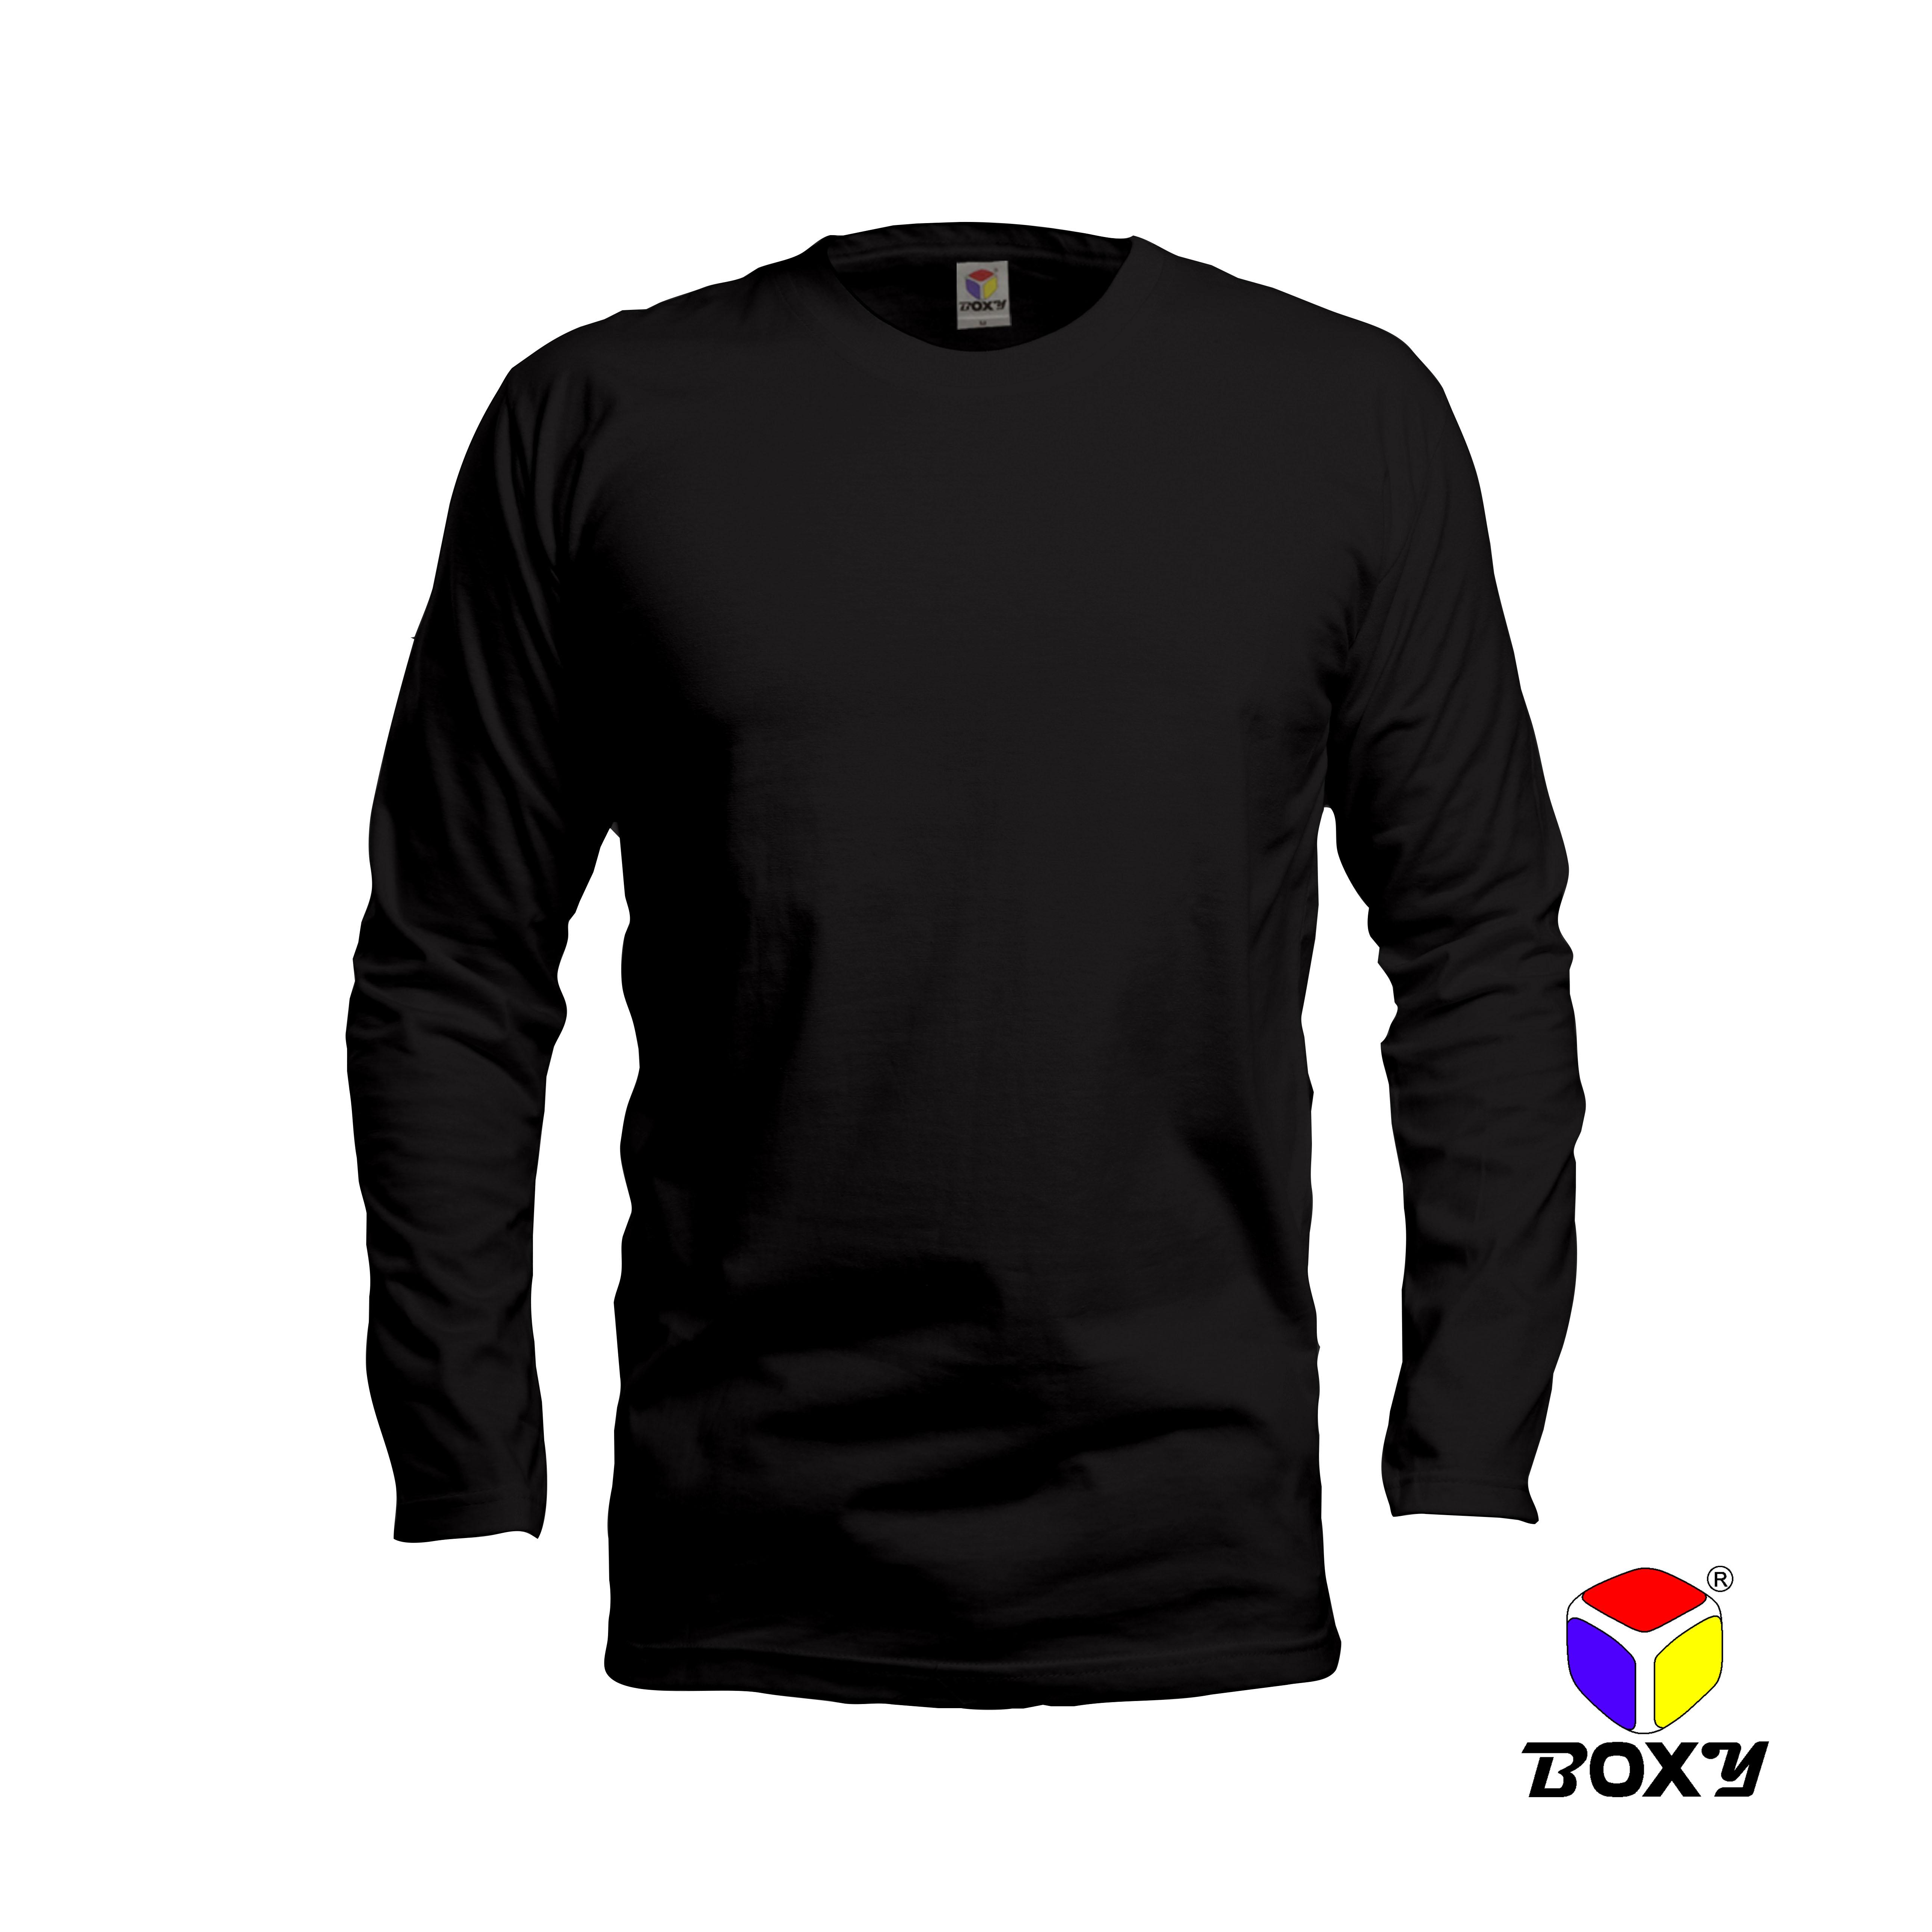 BOXY Microfiber Round Neck Long Sleeves Plain T-shirt (Black)